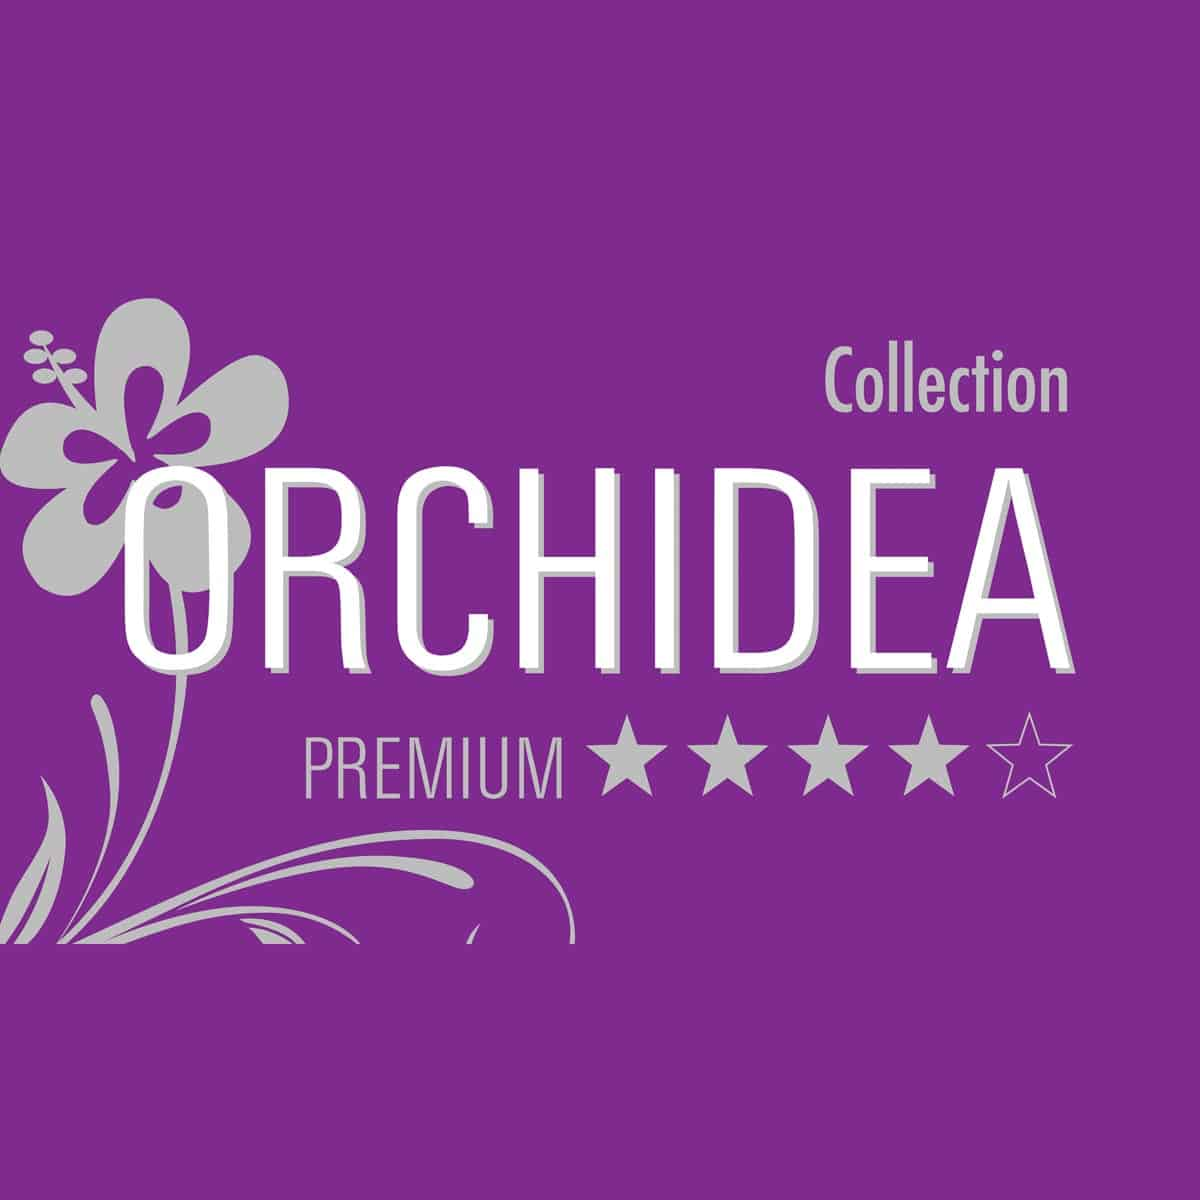 schlafstil daunendecke orchidea medium 100 daunen g nstig online kaufen bei bettwaren shop. Black Bedroom Furniture Sets. Home Design Ideas